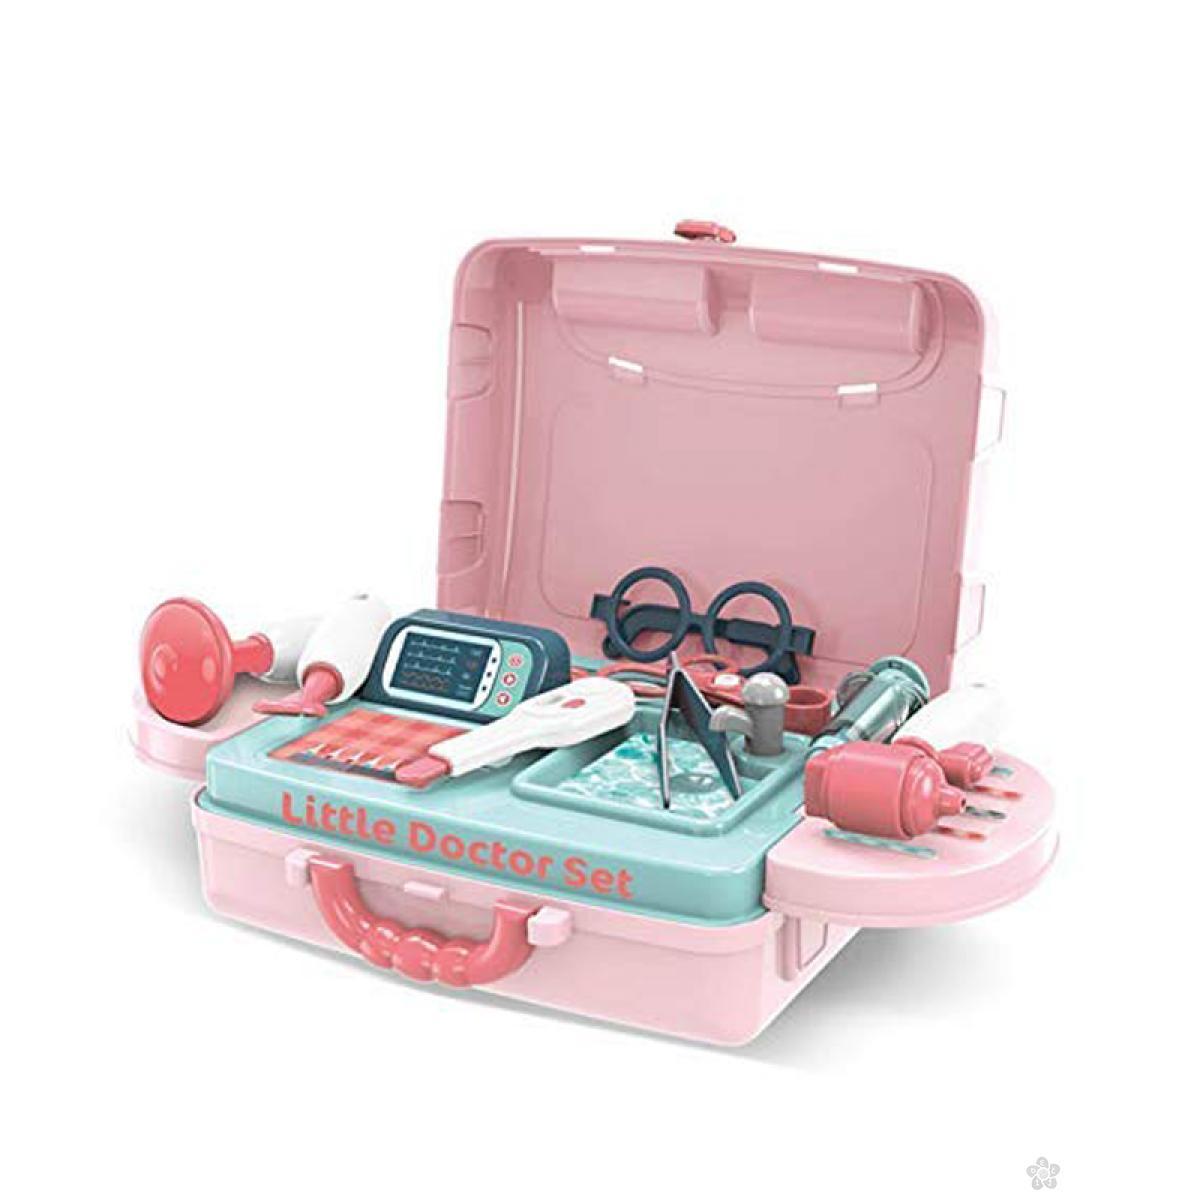 Doktor set u koferu 785137